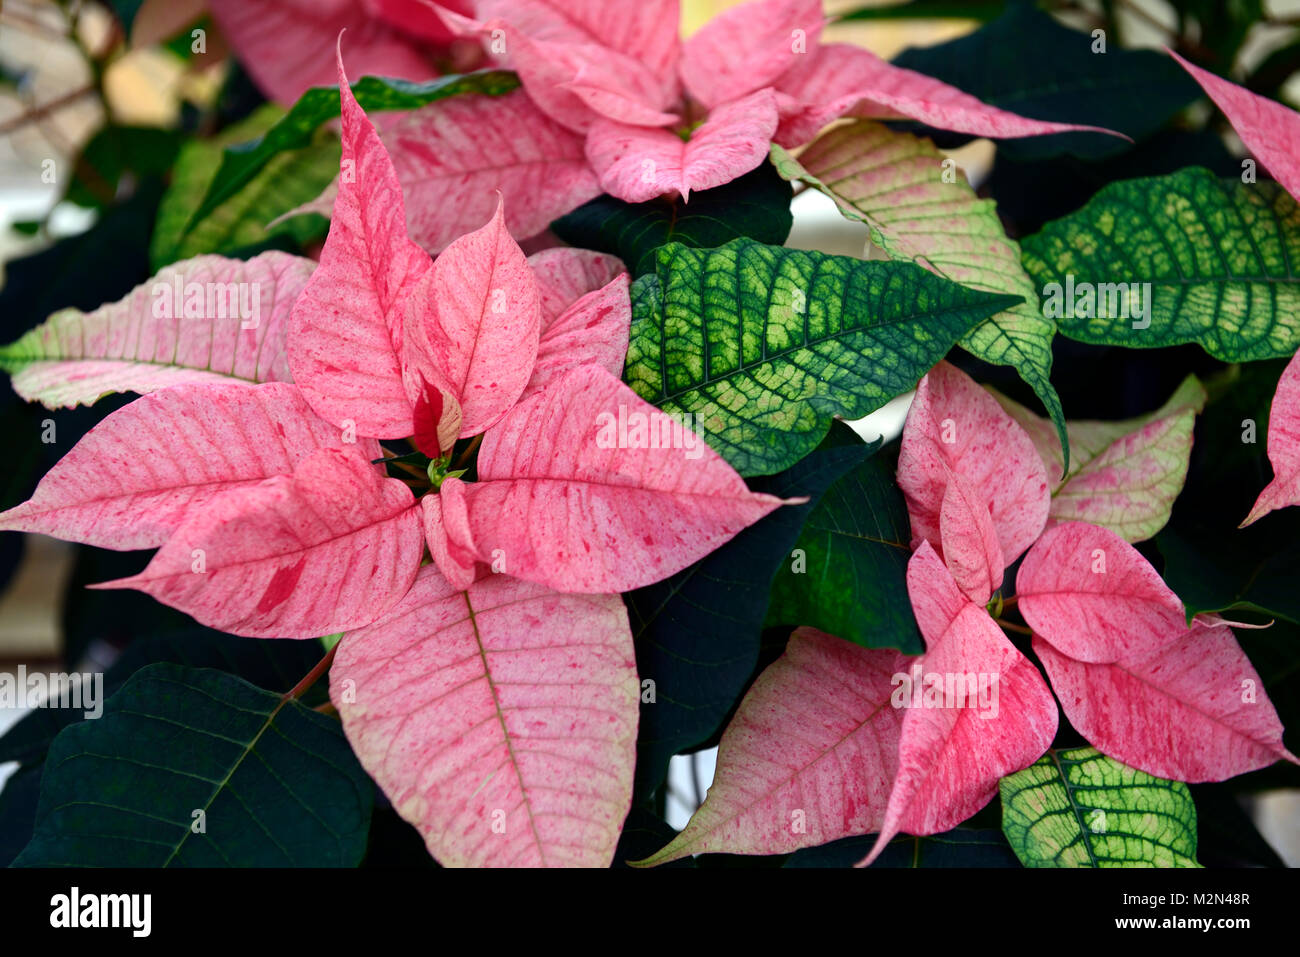 euphorbia pulcherrima christmas feelings fantasy,poinsettia,pink,flower,flowers,flowering,christmas,associate,associated,christmas - Stock Image